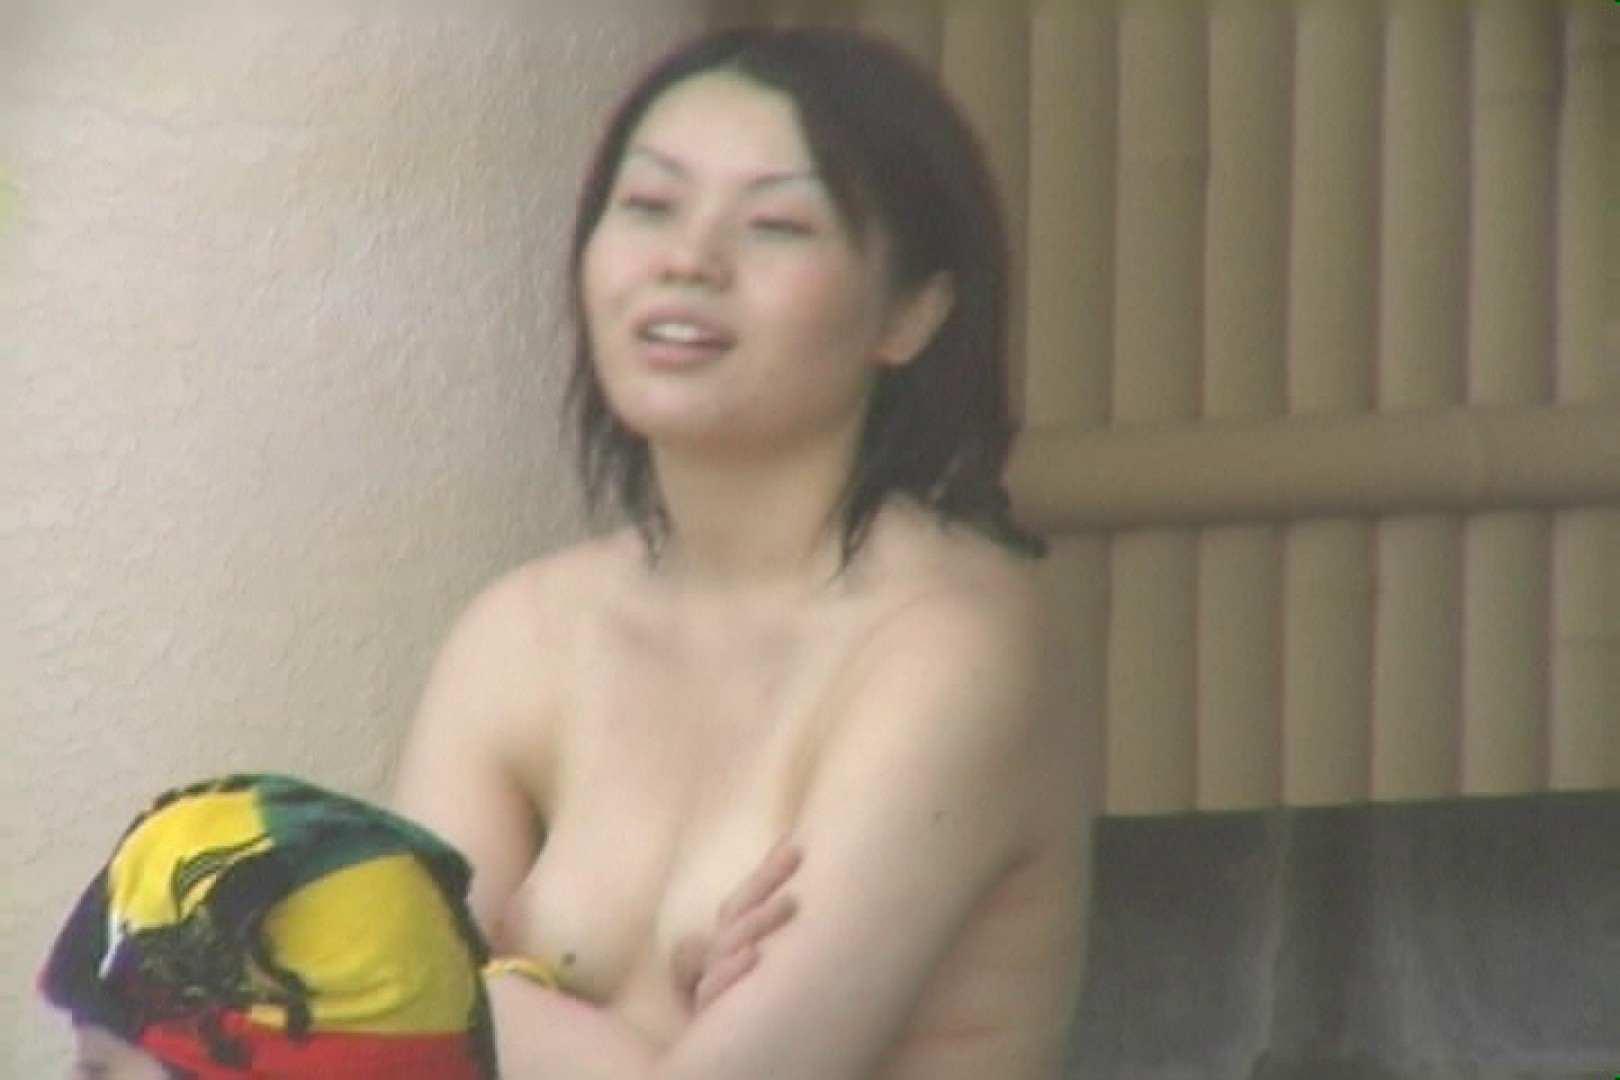 Aquaな露天風呂Vol.61【VIP限定】 露天 エロ無料画像 89連発 63